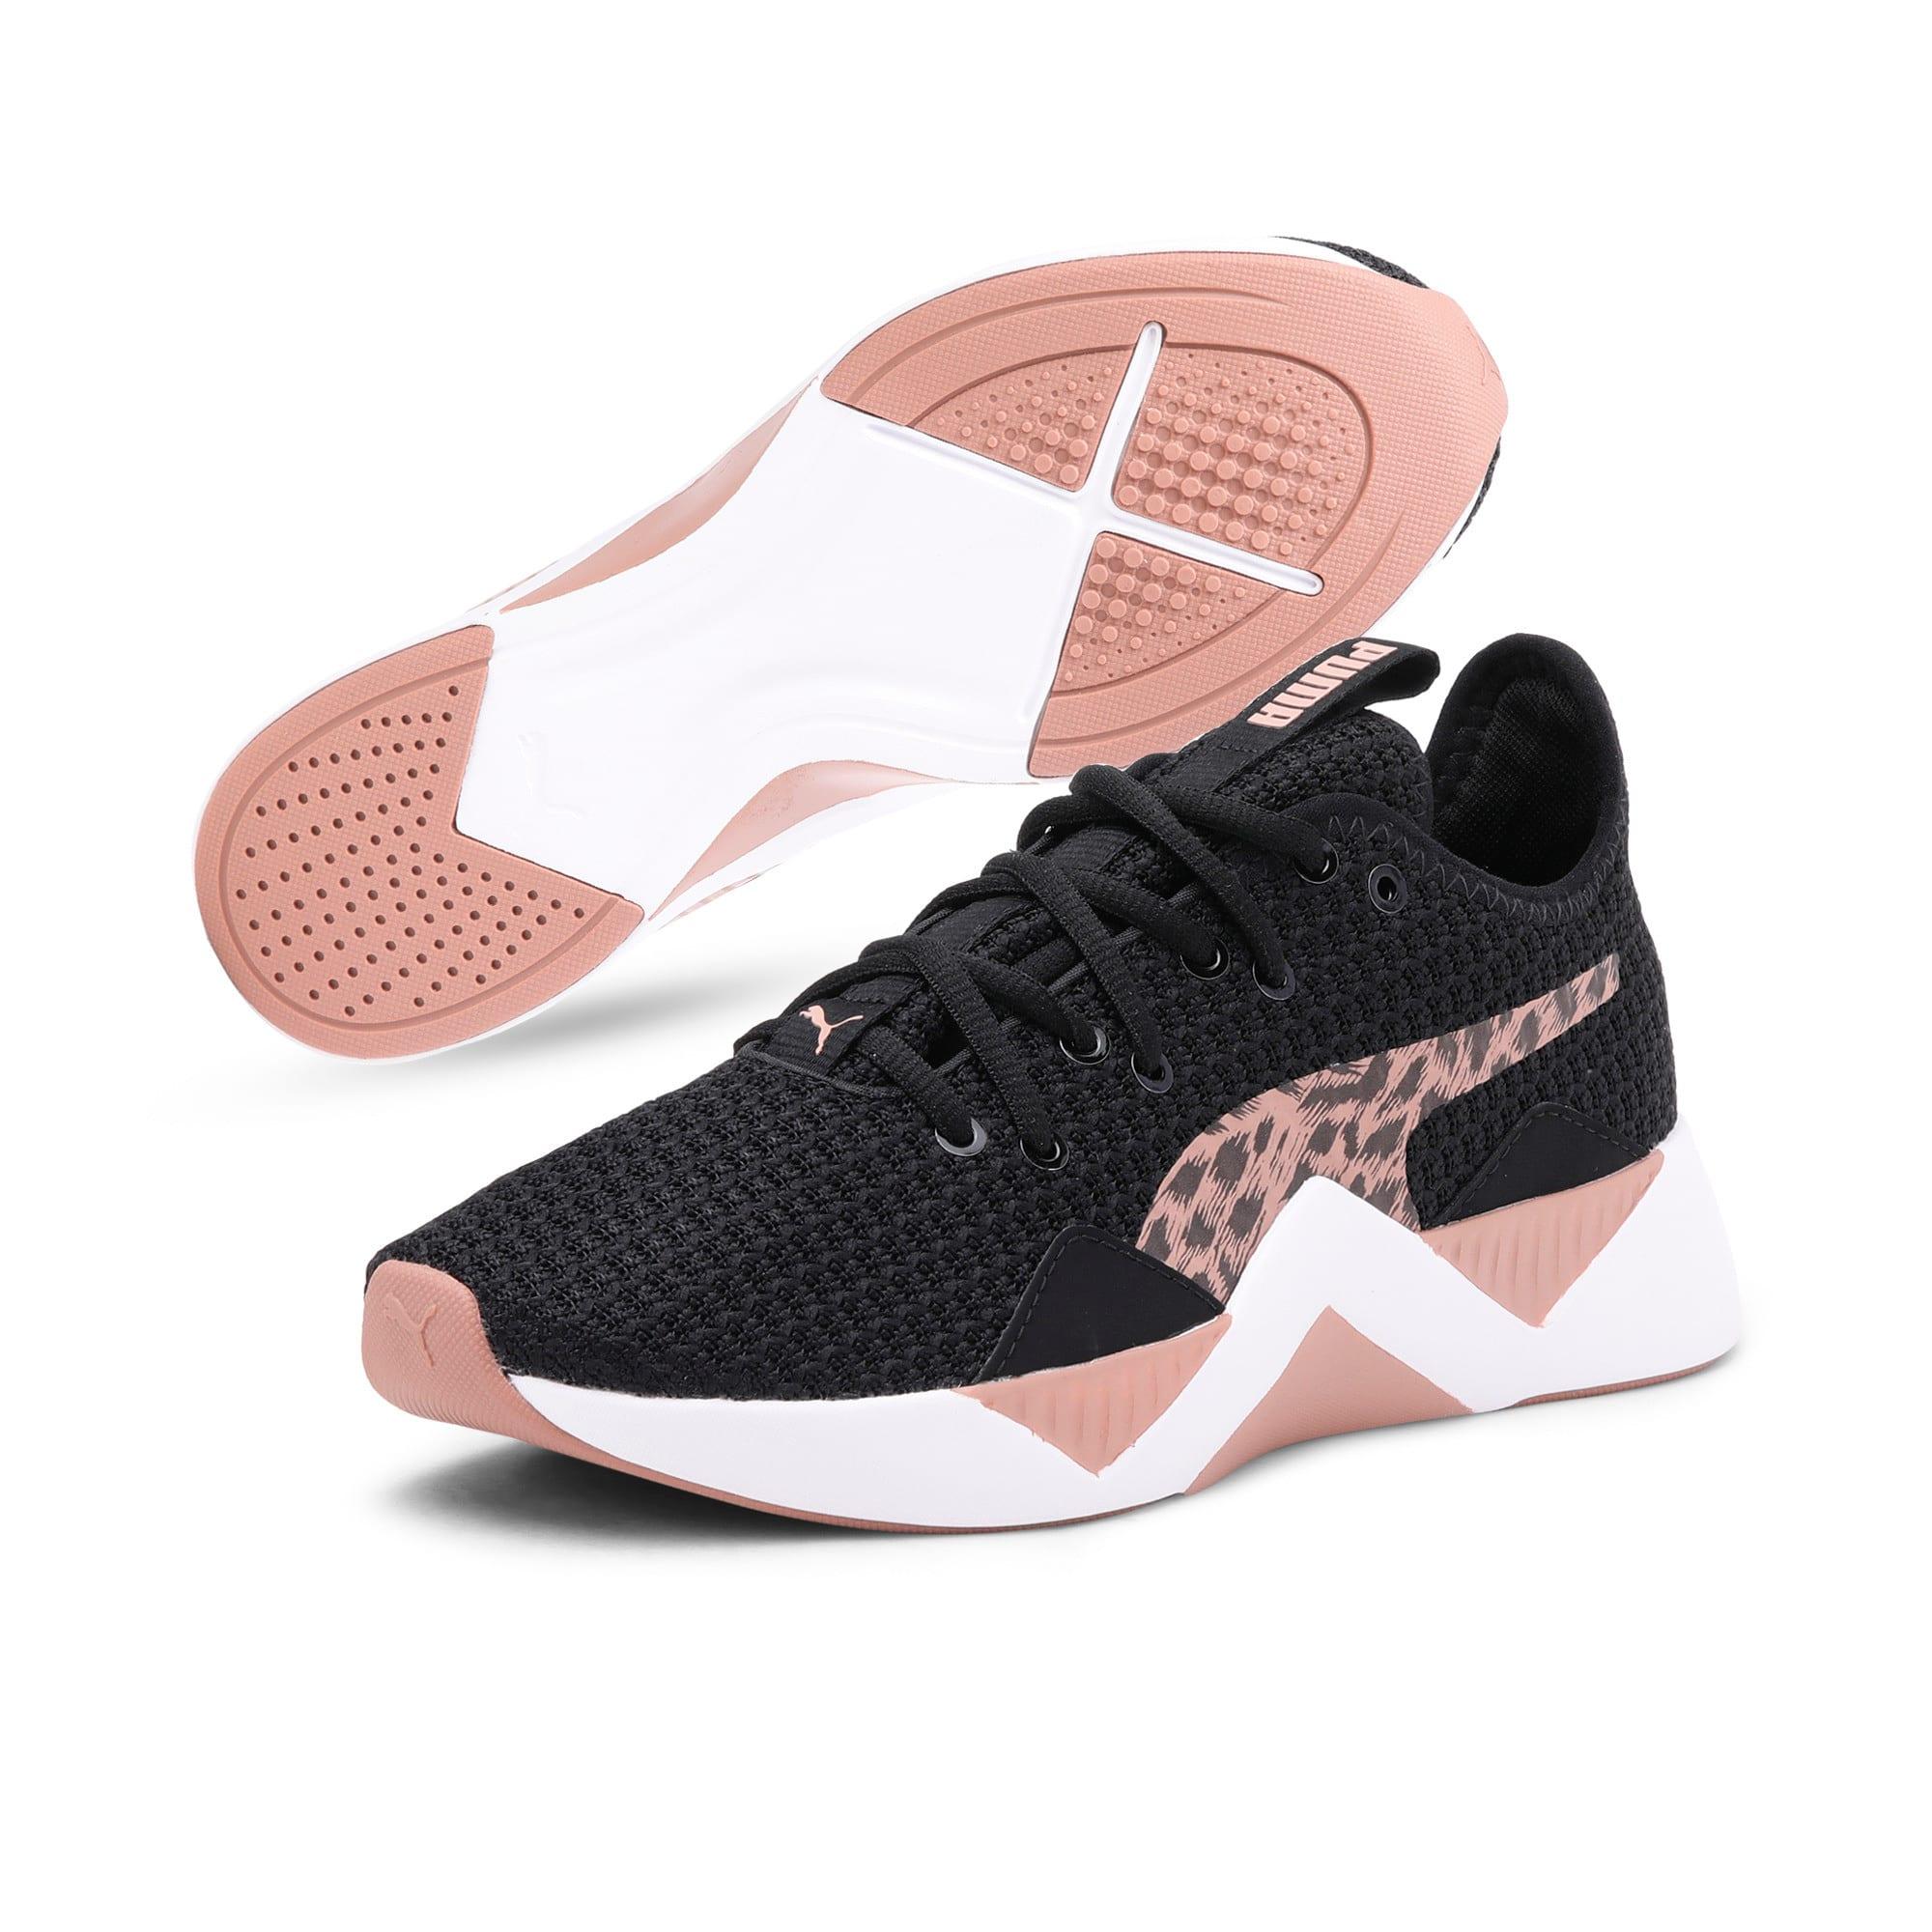 Thumbnail 2 of Incite Leopard Women's Sneakers, Puma Black-Mocha Mousse, medium